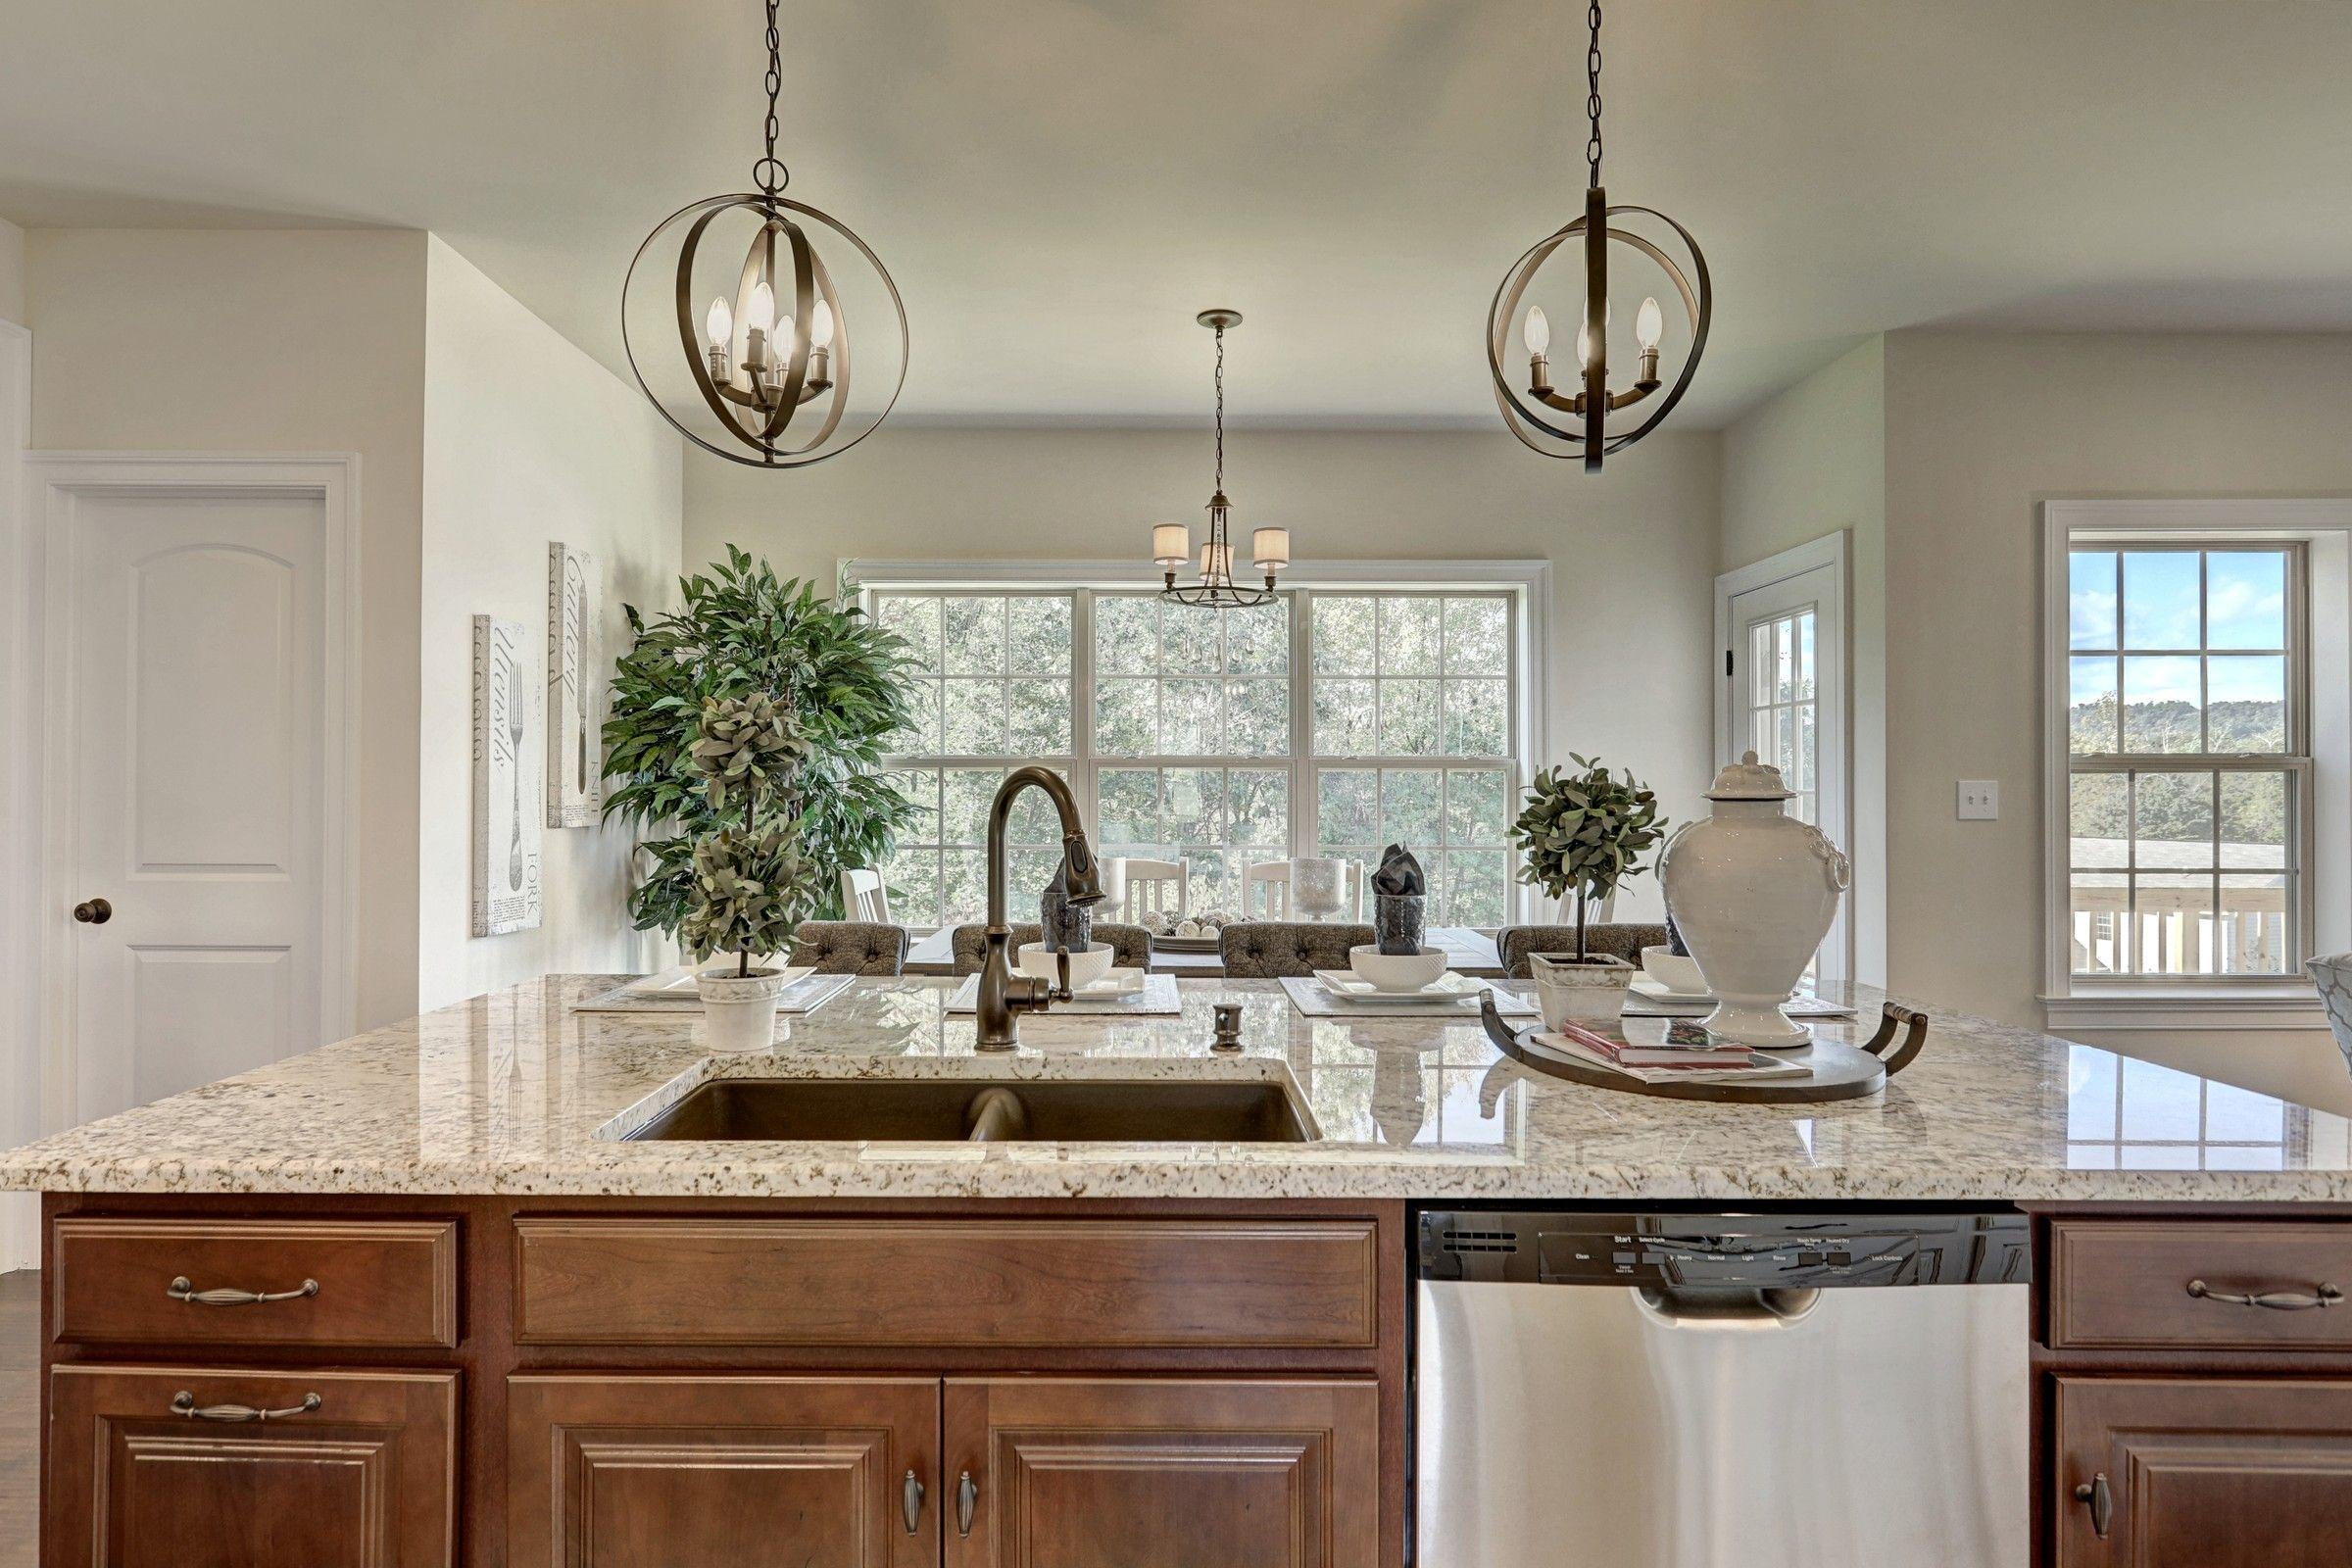 Kitchen featured in the Parker Bordeaux By Keystone Custom Homes in Philadelphia, PA